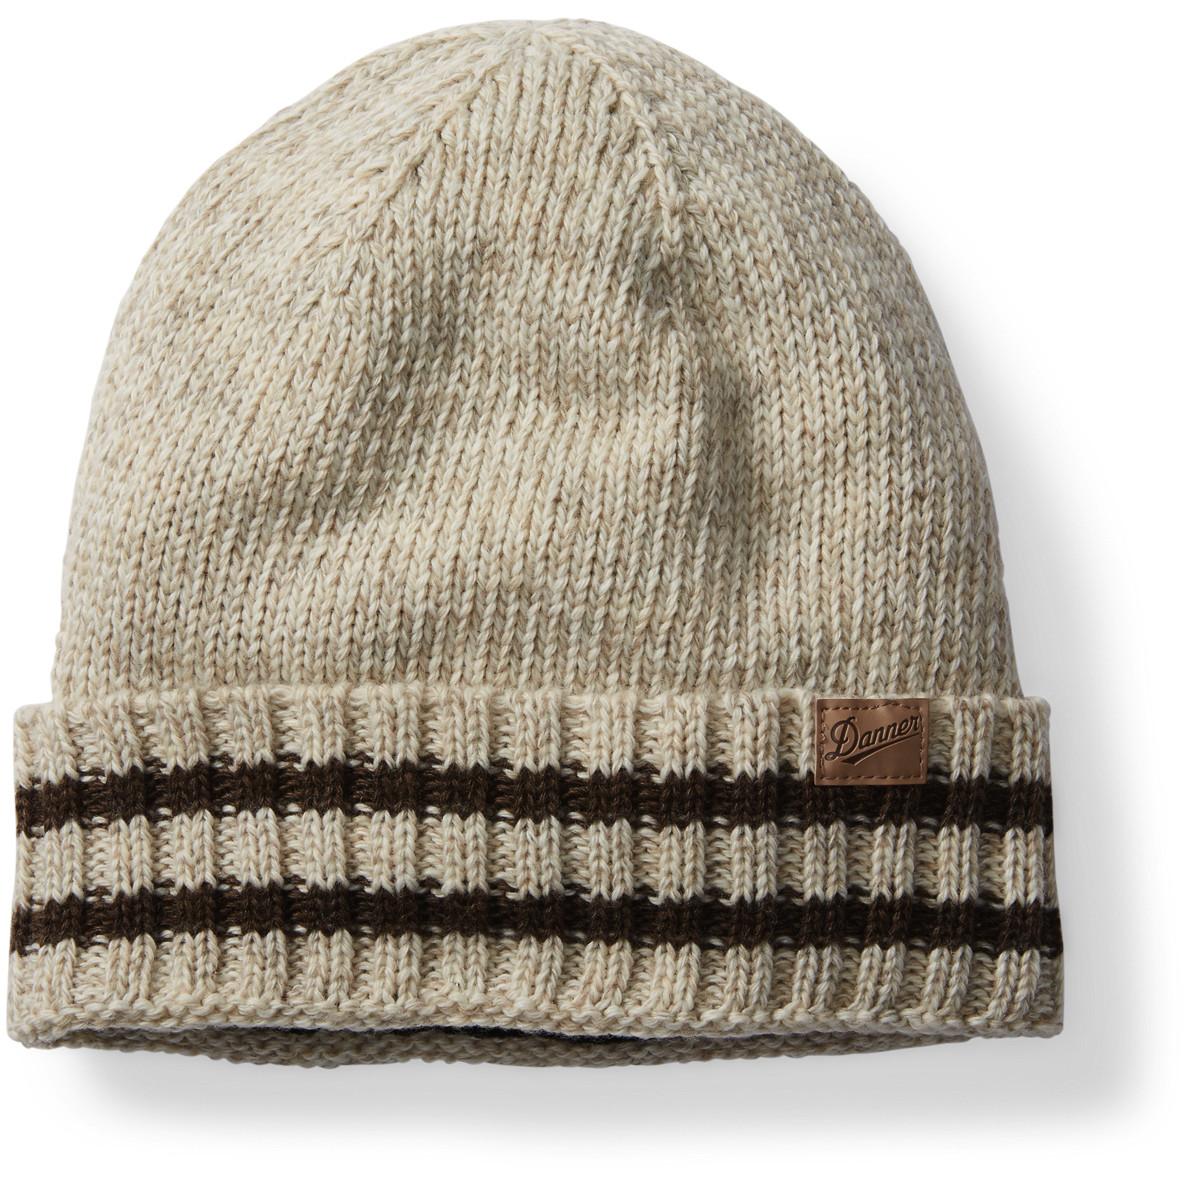 Danner Ragg Wool Cuff Beanie - Atmosphere